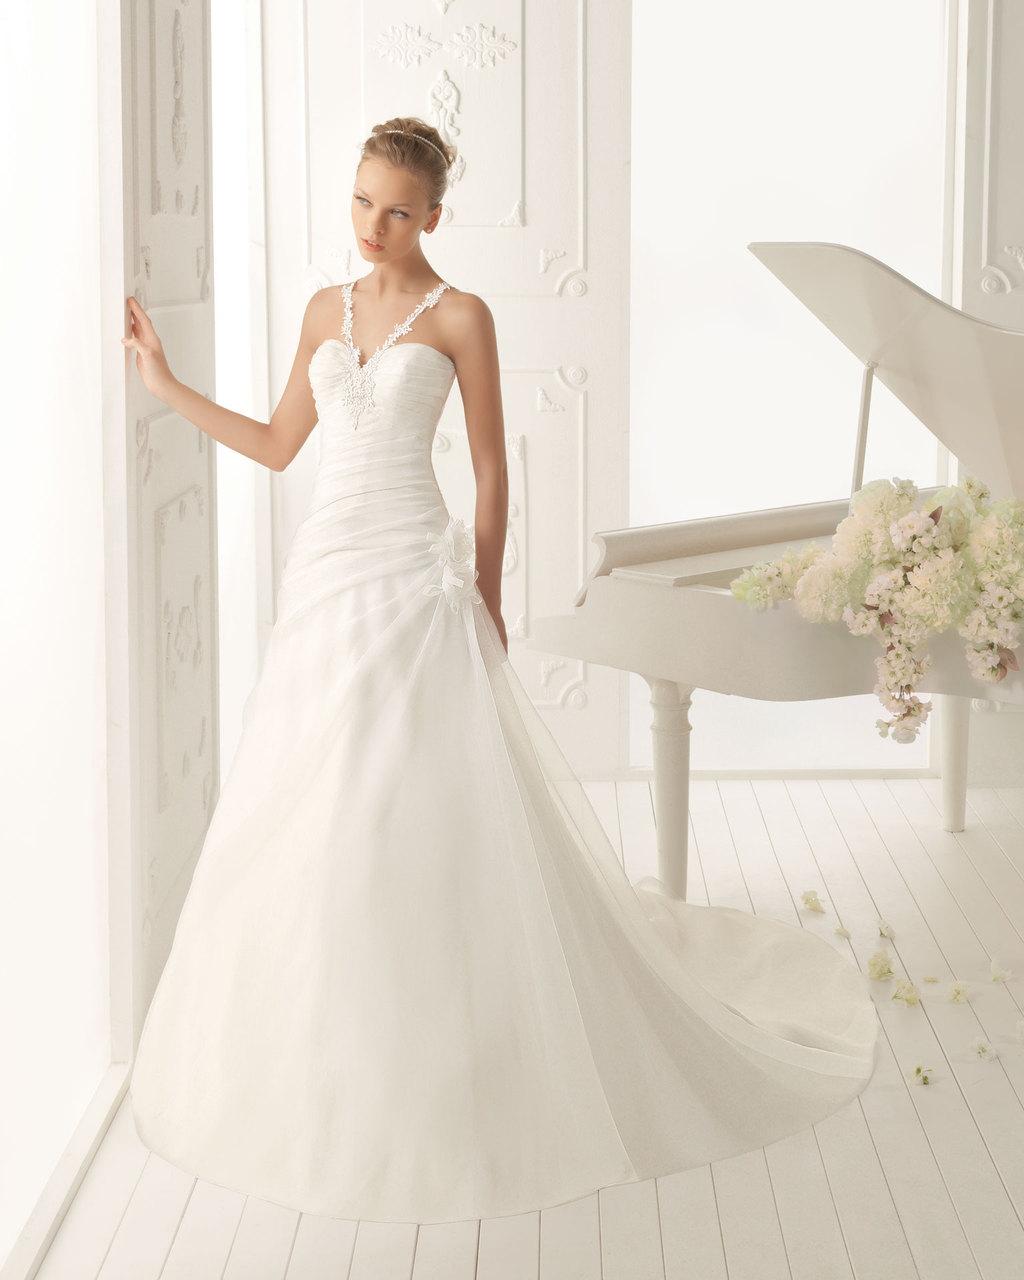 Aire-barcelona-wedding-dress-2013-vintage-bridal-collection-varsovia.full